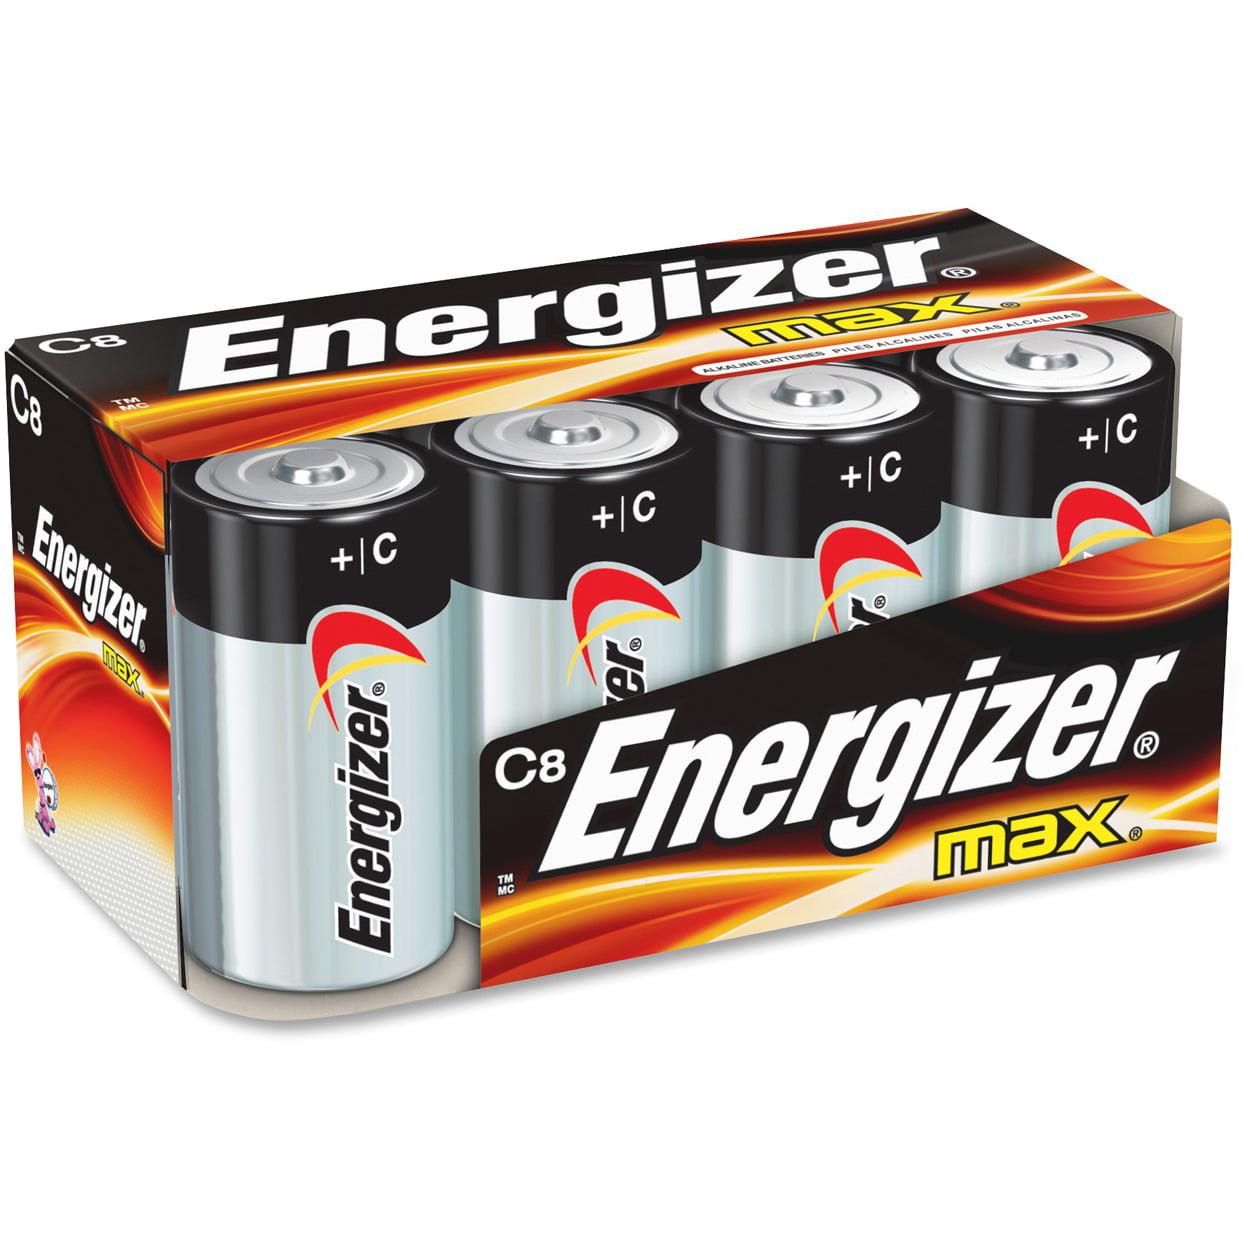 Energizer MAX Alkaline C Batteries, 8 Count